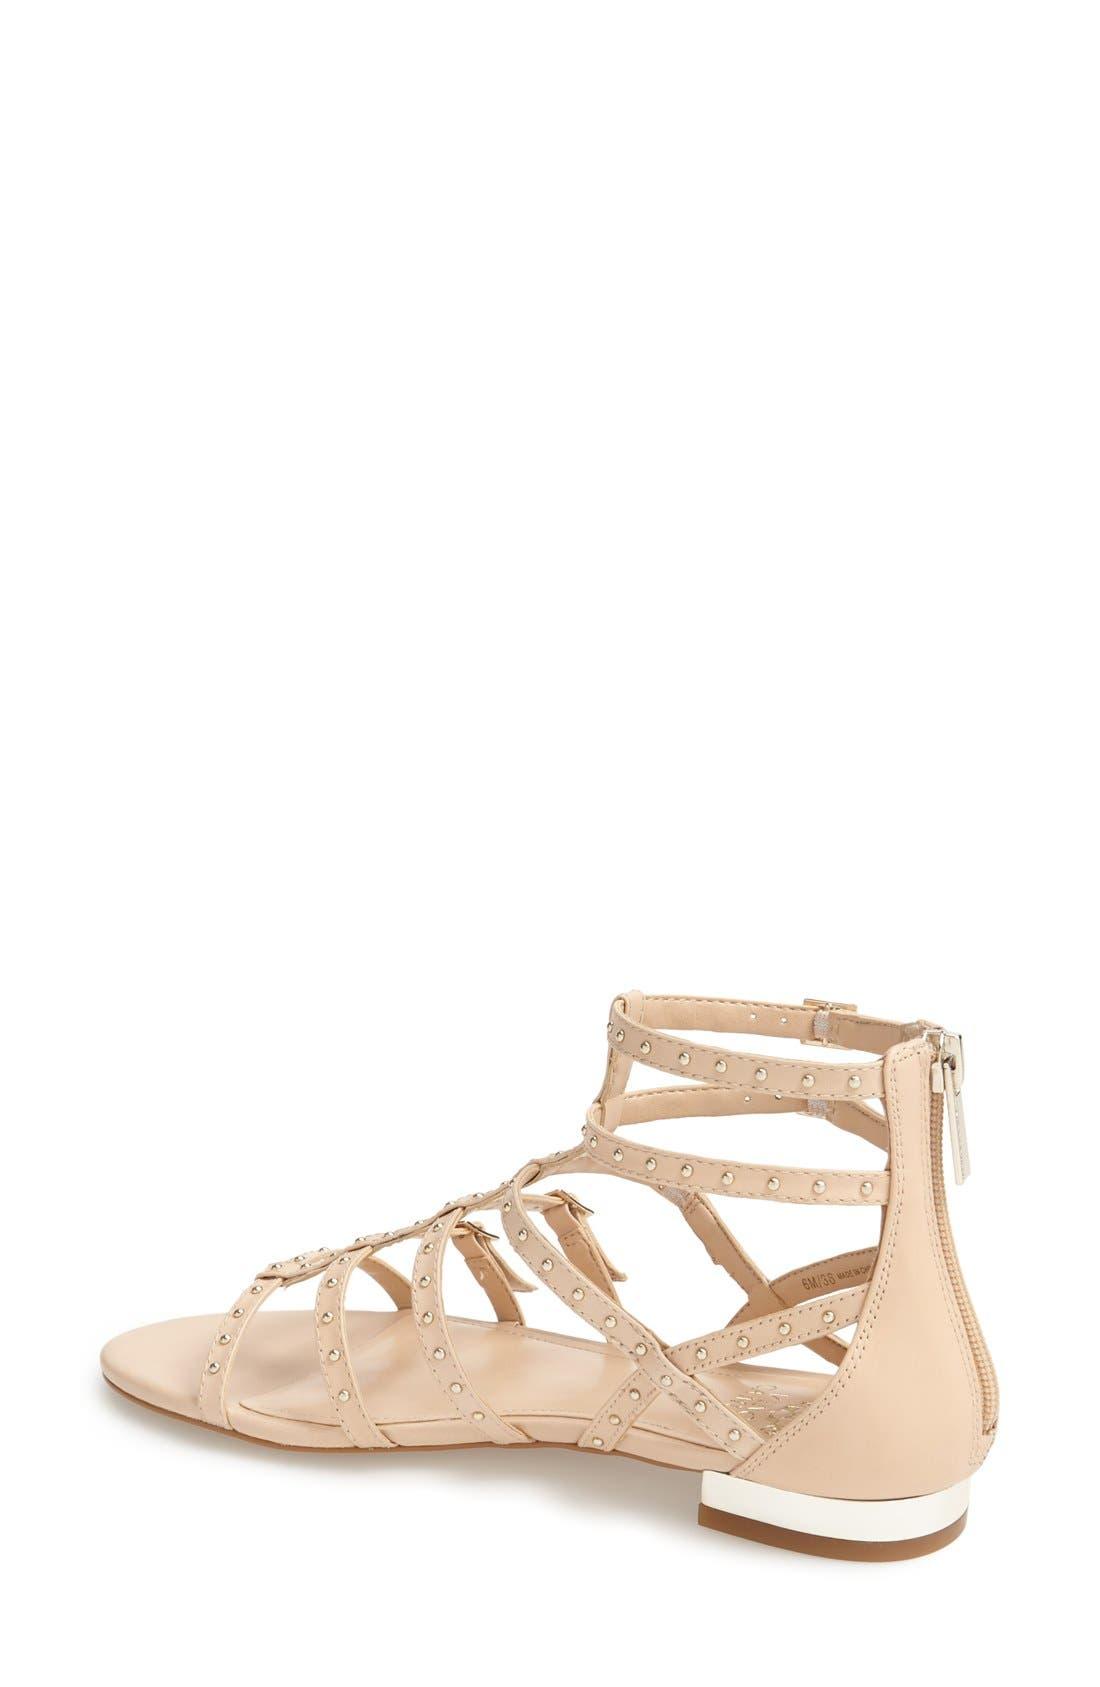 Alternate Image 2  - Vince Camuto 'Hevelli' Studded Leather Gladiator Sandal (Women)